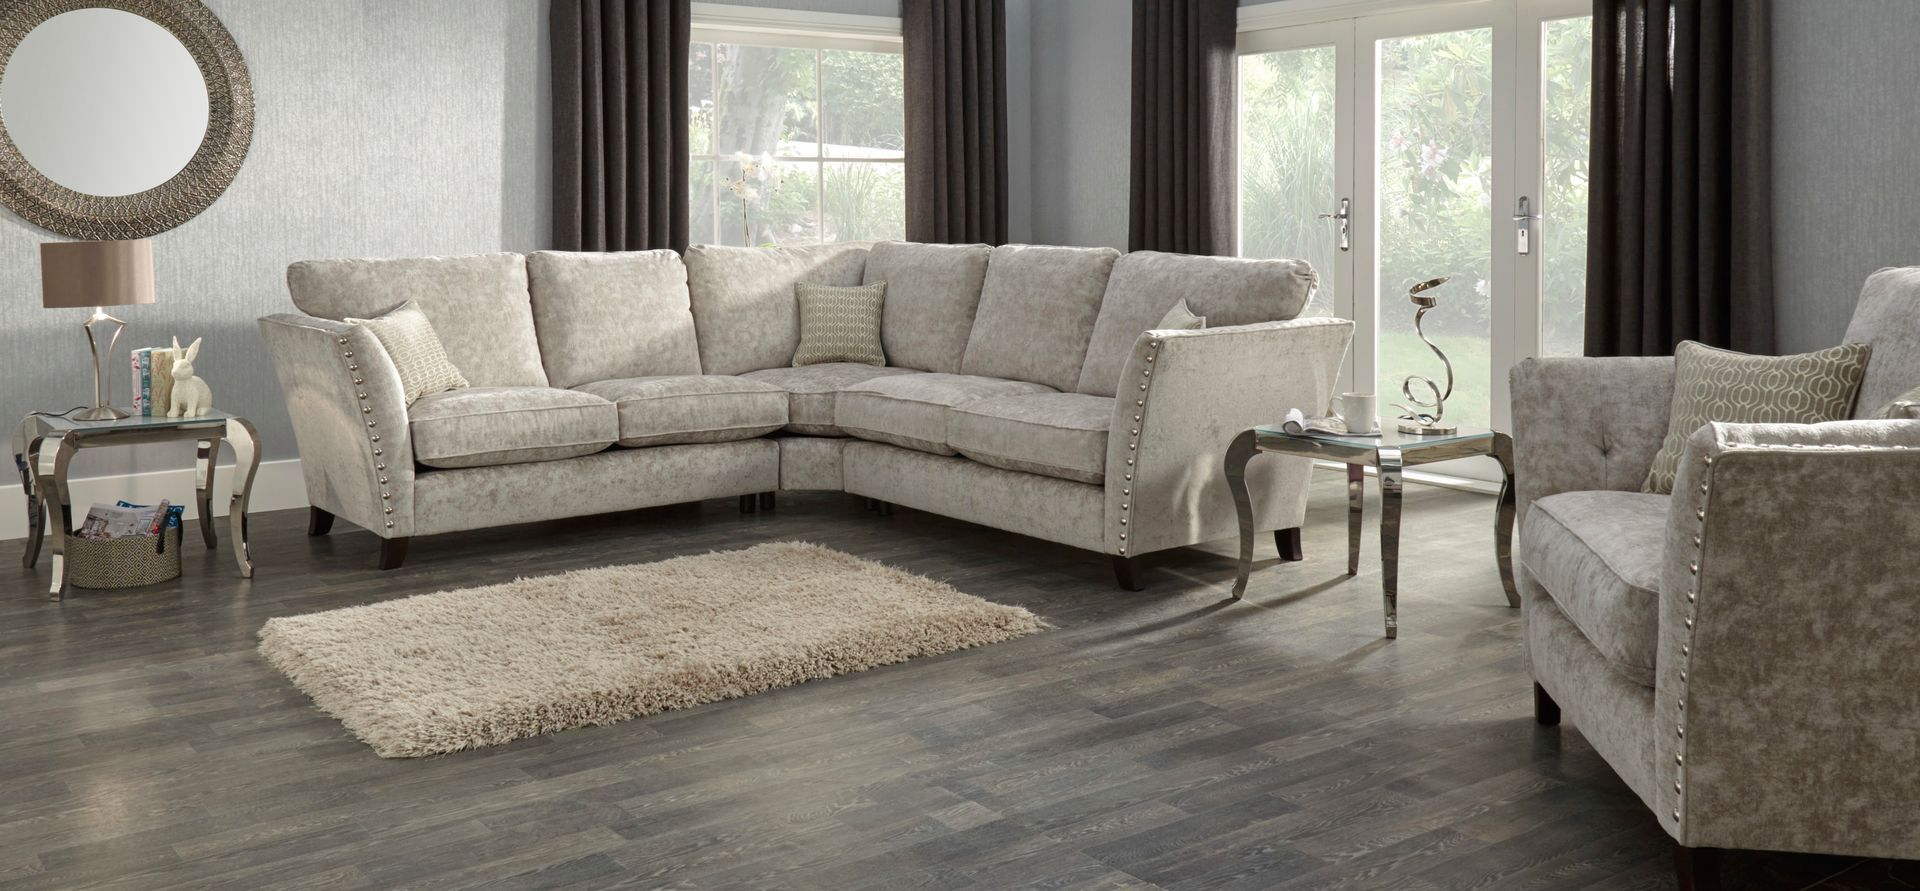 Rihanna 2 Corner 2 Standard Back Fabric Sofa Scs Buy Sofa Online Carpets For Kids Living Spaces